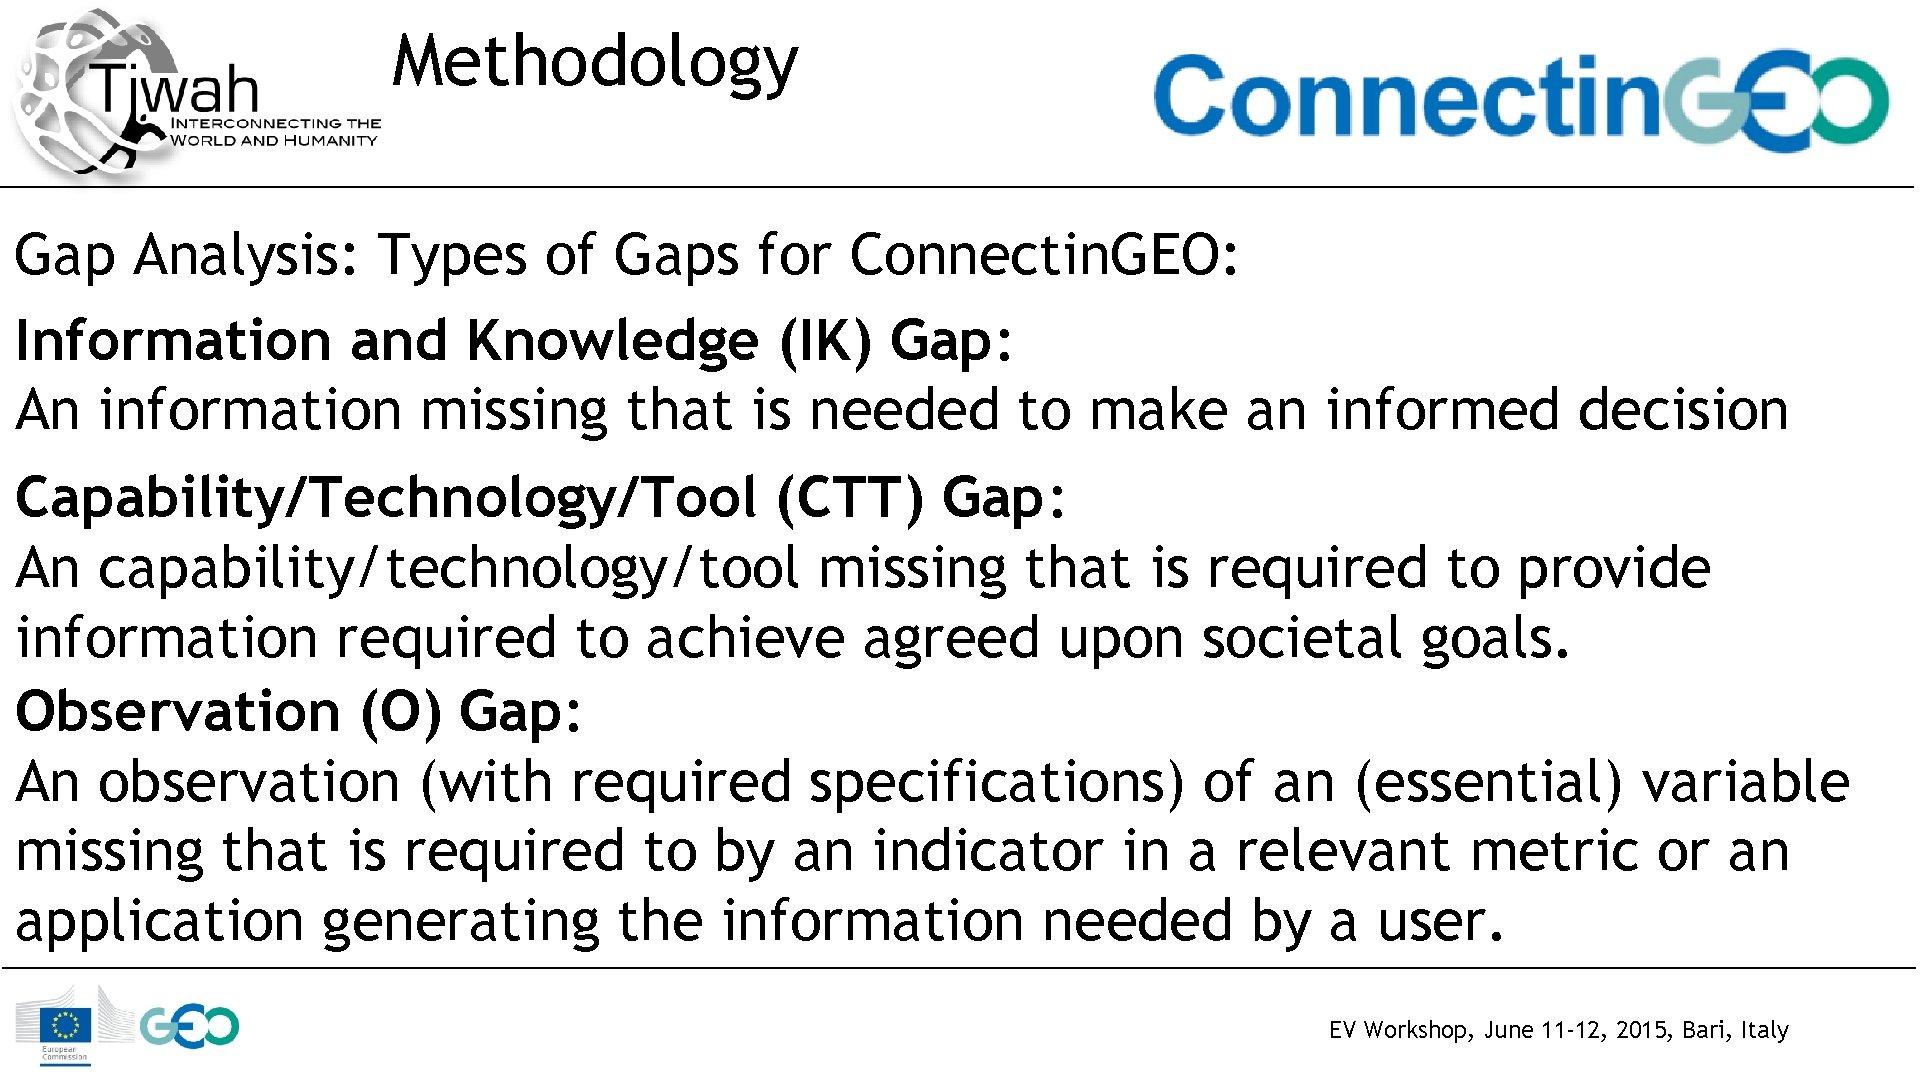 Methodology Gap Analysis: Types of Gaps for Connectin. GEO: Information and Knowledge (IK) Gap: